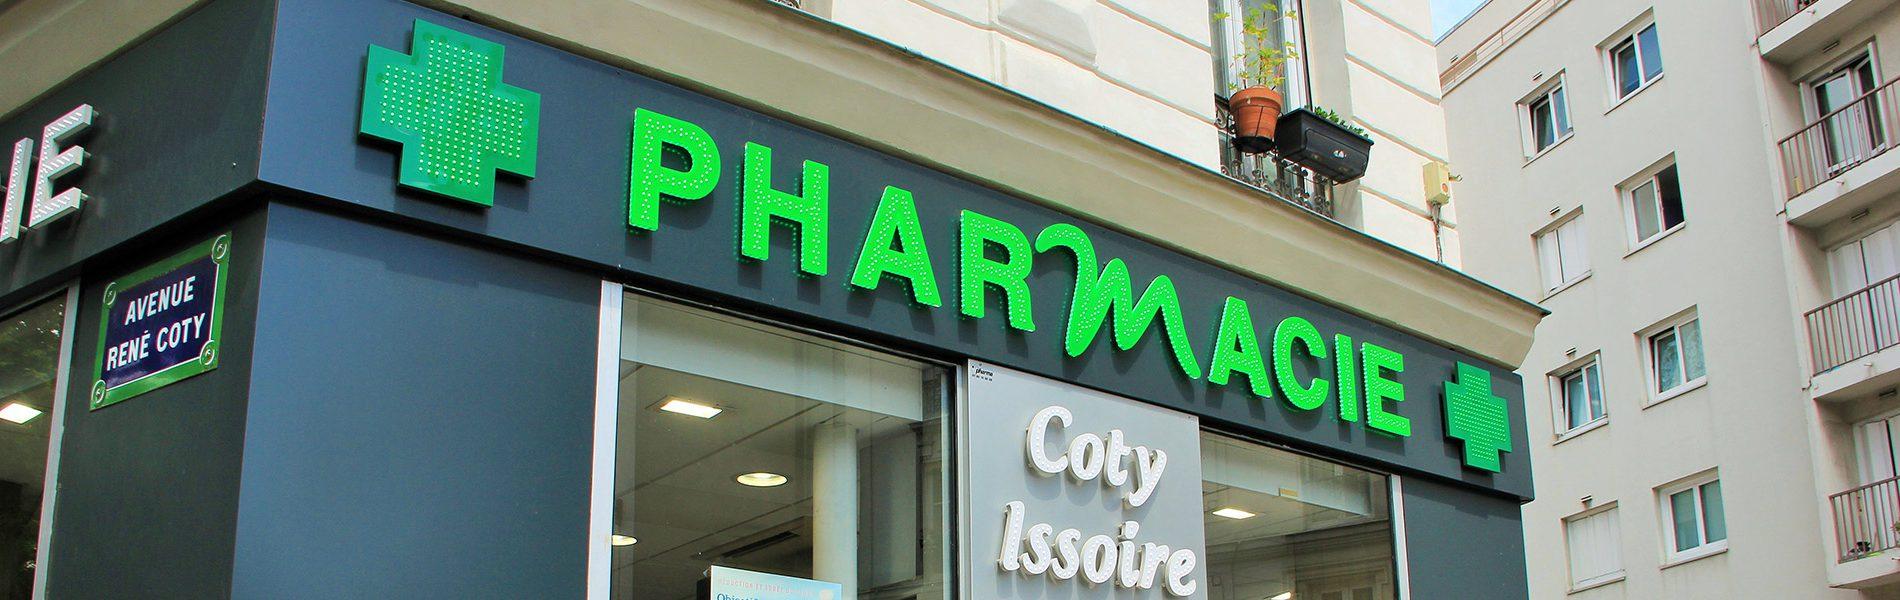 Pharmacie COTY ISSOIRE - Image Homepage 2